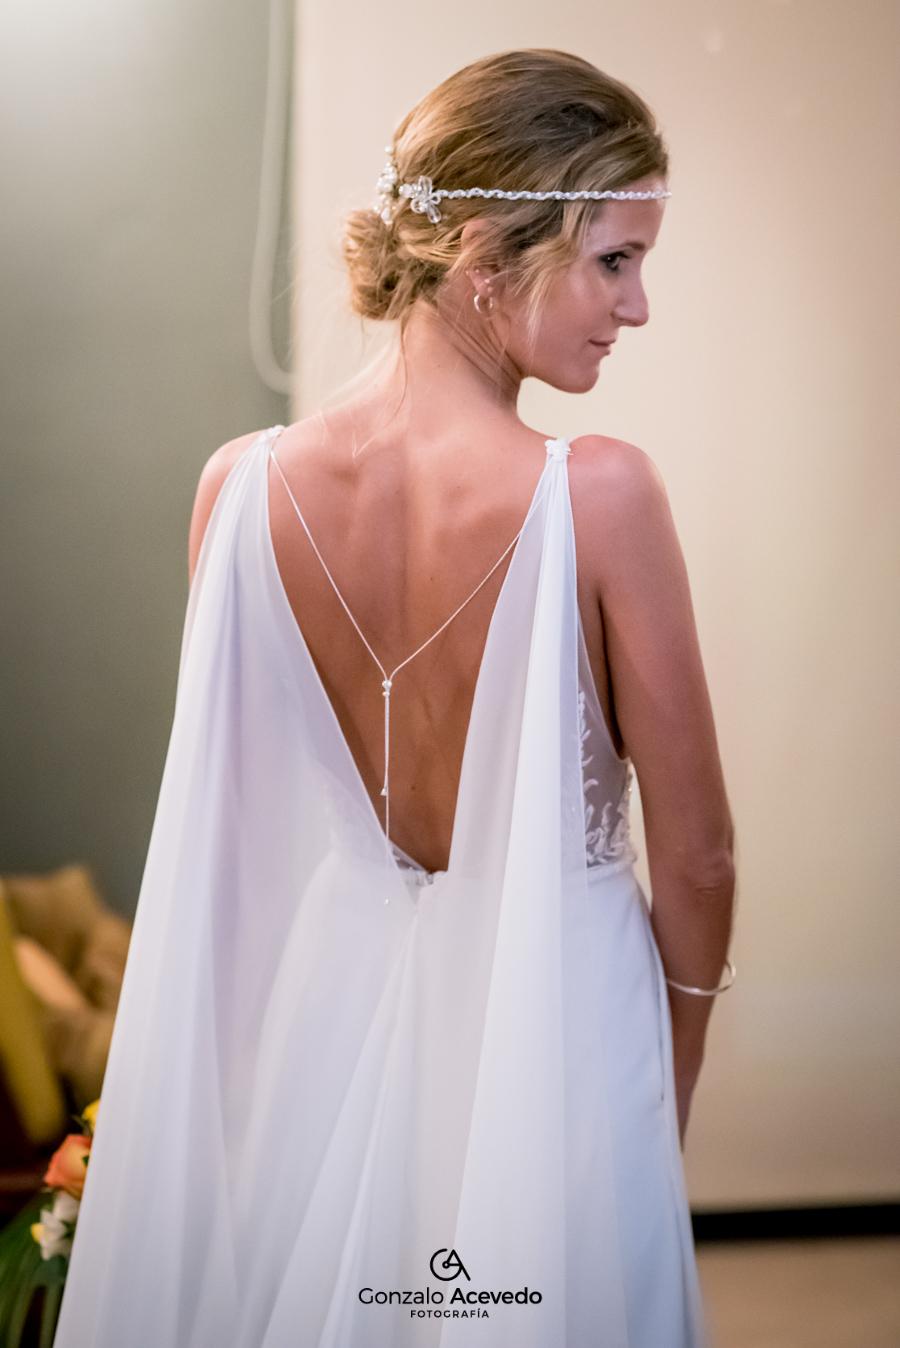 Caro boda previa dress blanco peinado hairstyle makeup ideas originales #gonzaloacevedofotografia gonzalo acevedo